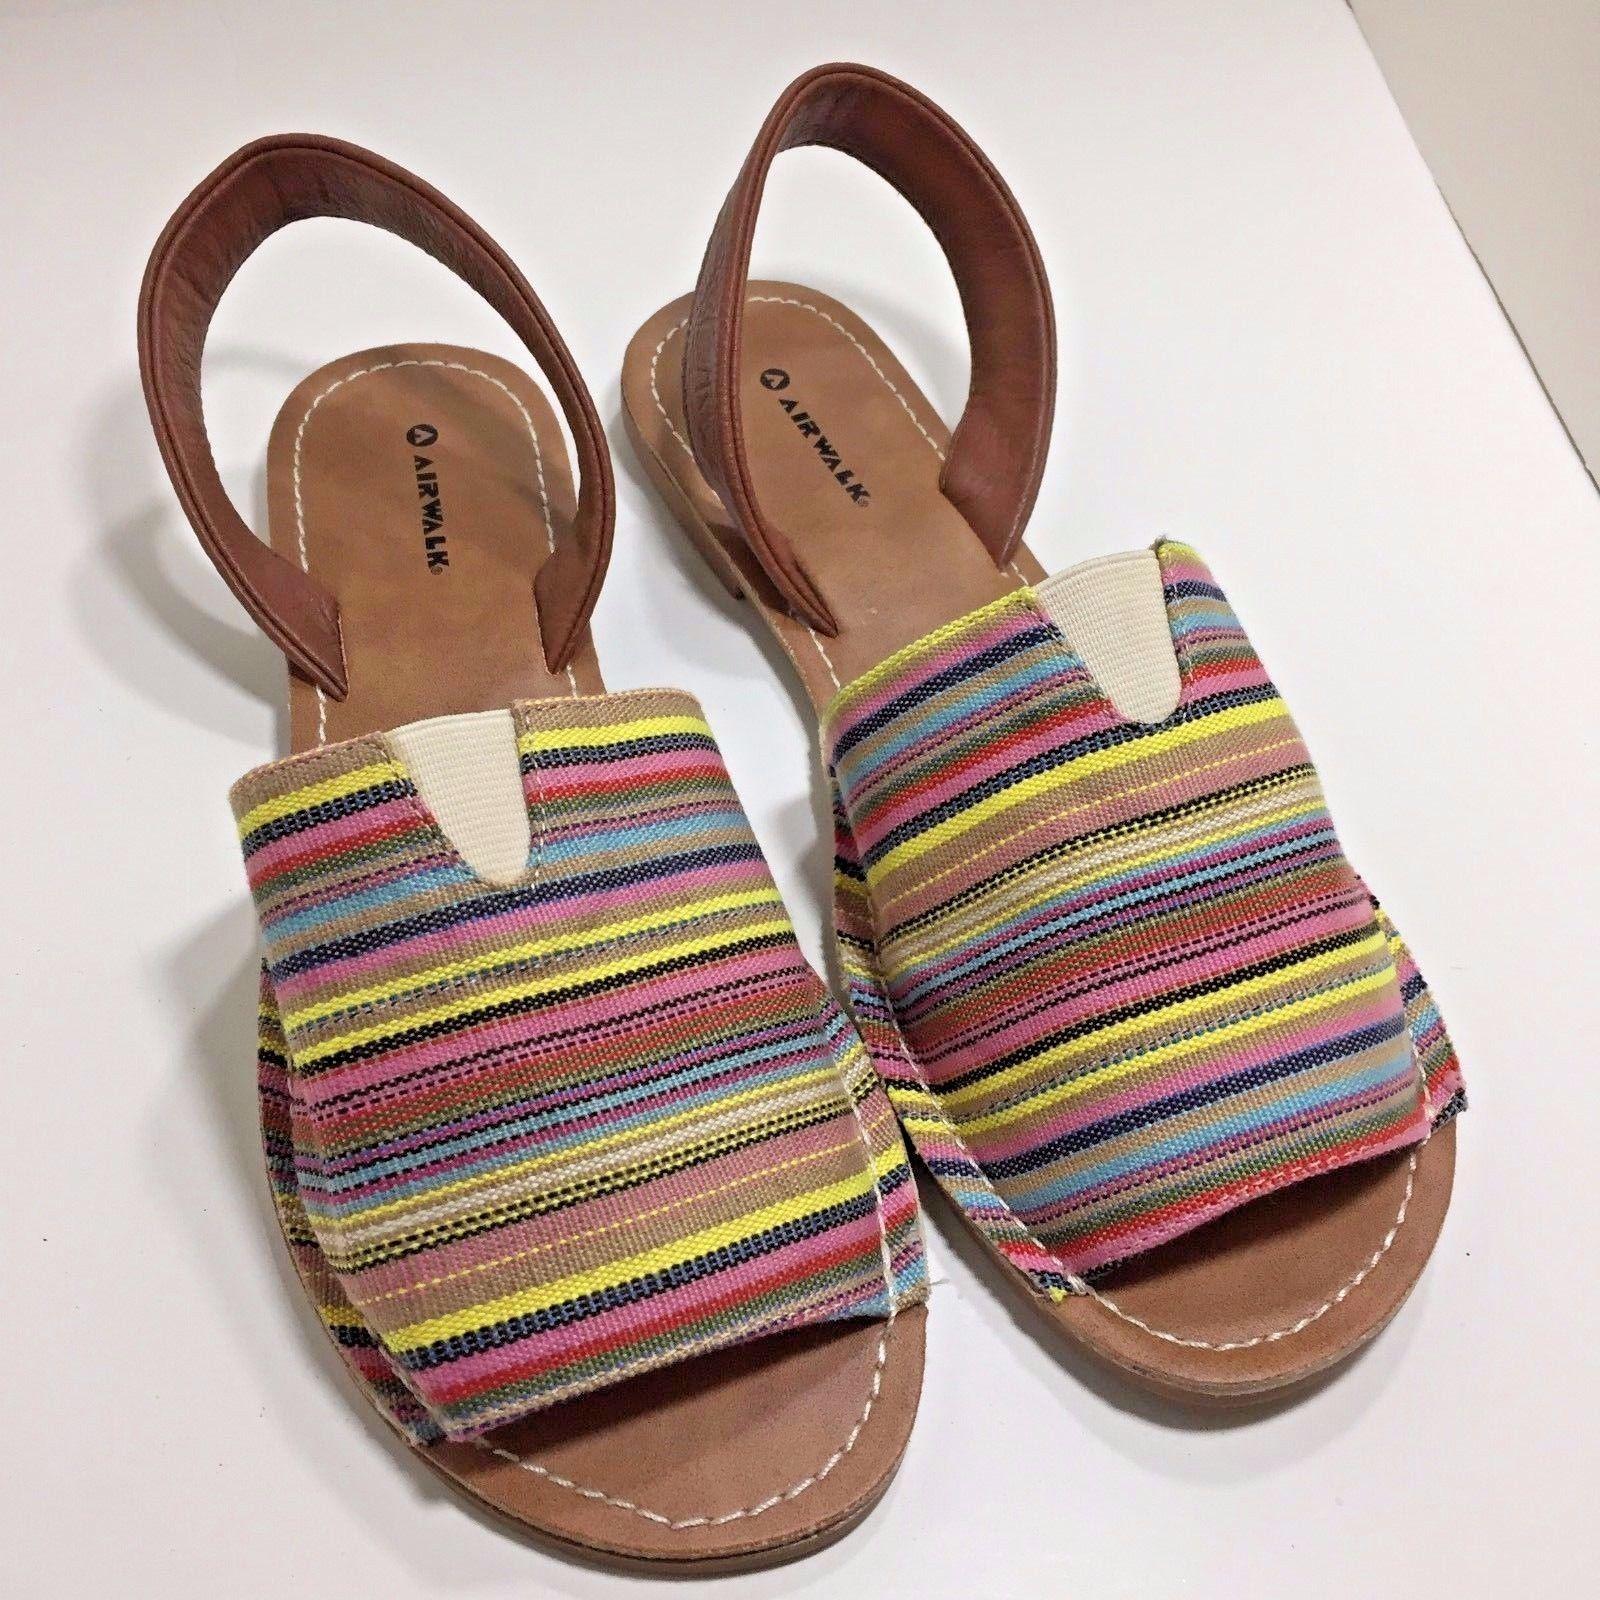 Buy airwalk sandals womens - 61% OFF a5679dff4a